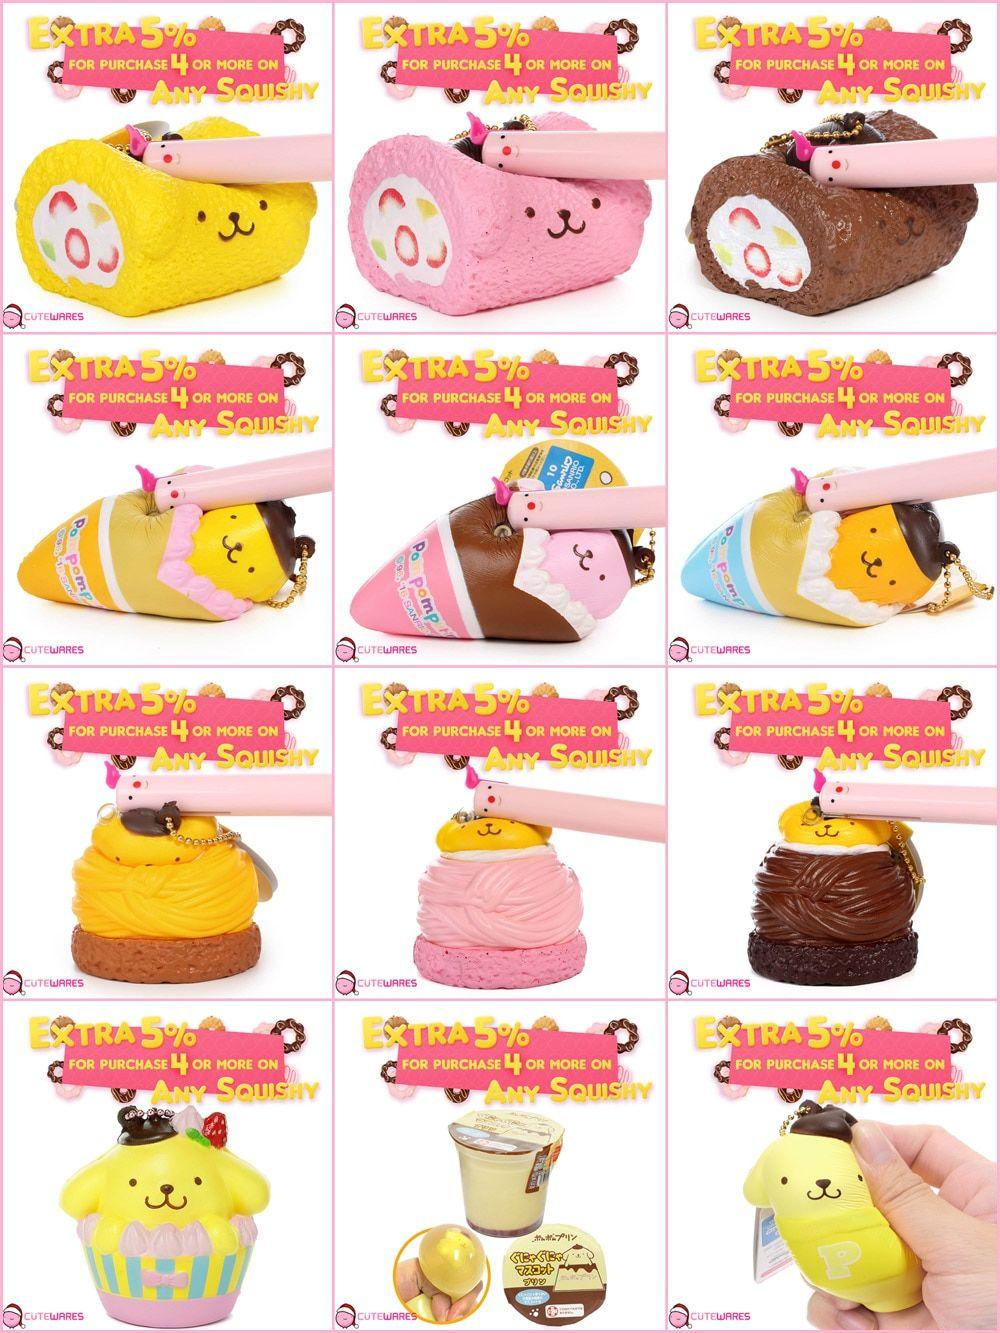 Sanrio Cute Squishy Mascot Pompompurin Squishy by NIC